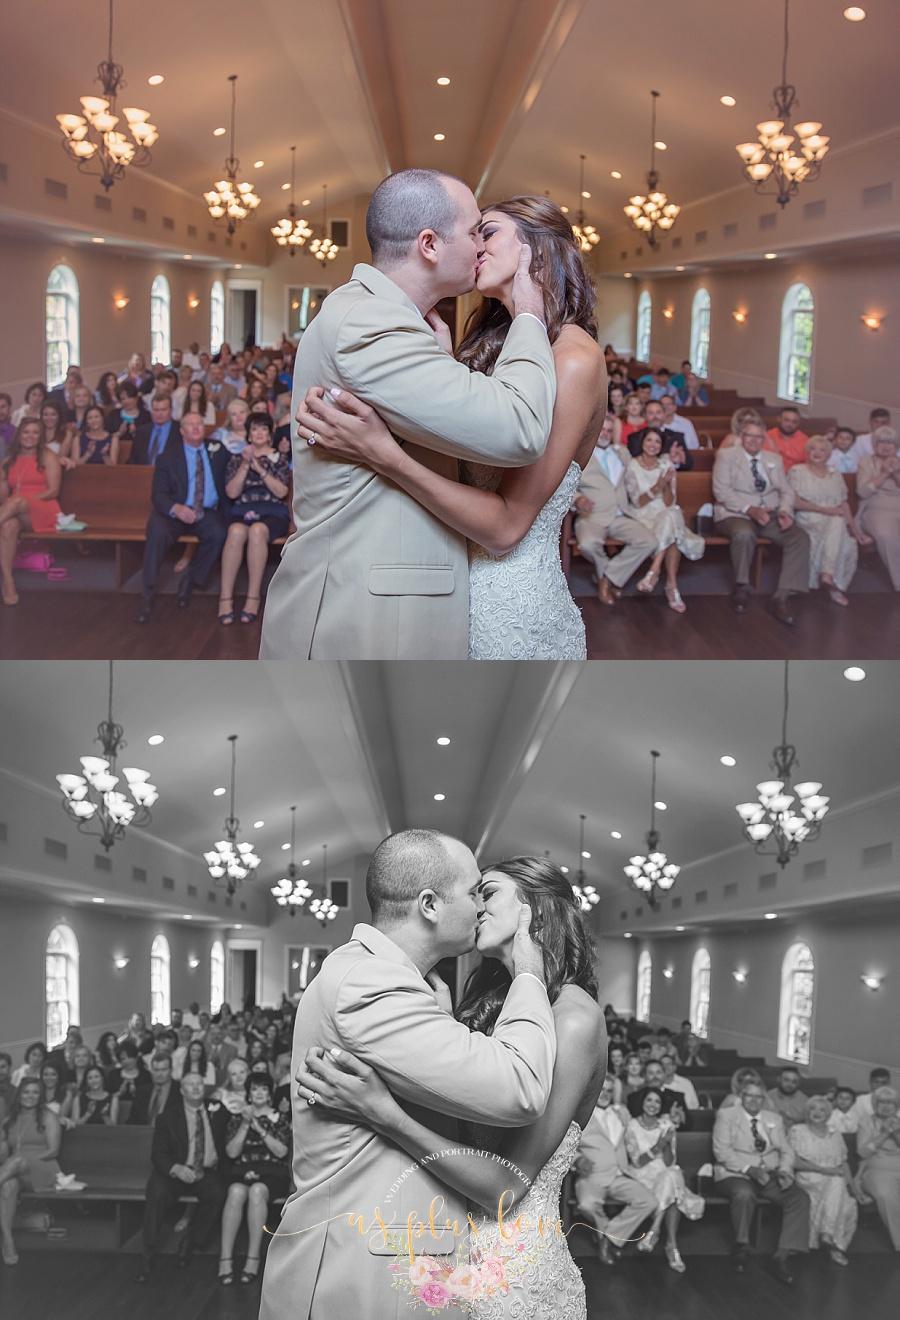 wedding-photographer-houston-area-the-woodlands-tx-77381-magnolia-venue-ashelynn-manor-bride-groom-kiss-first-family-love-moment-i-do-black-and-white.jpg